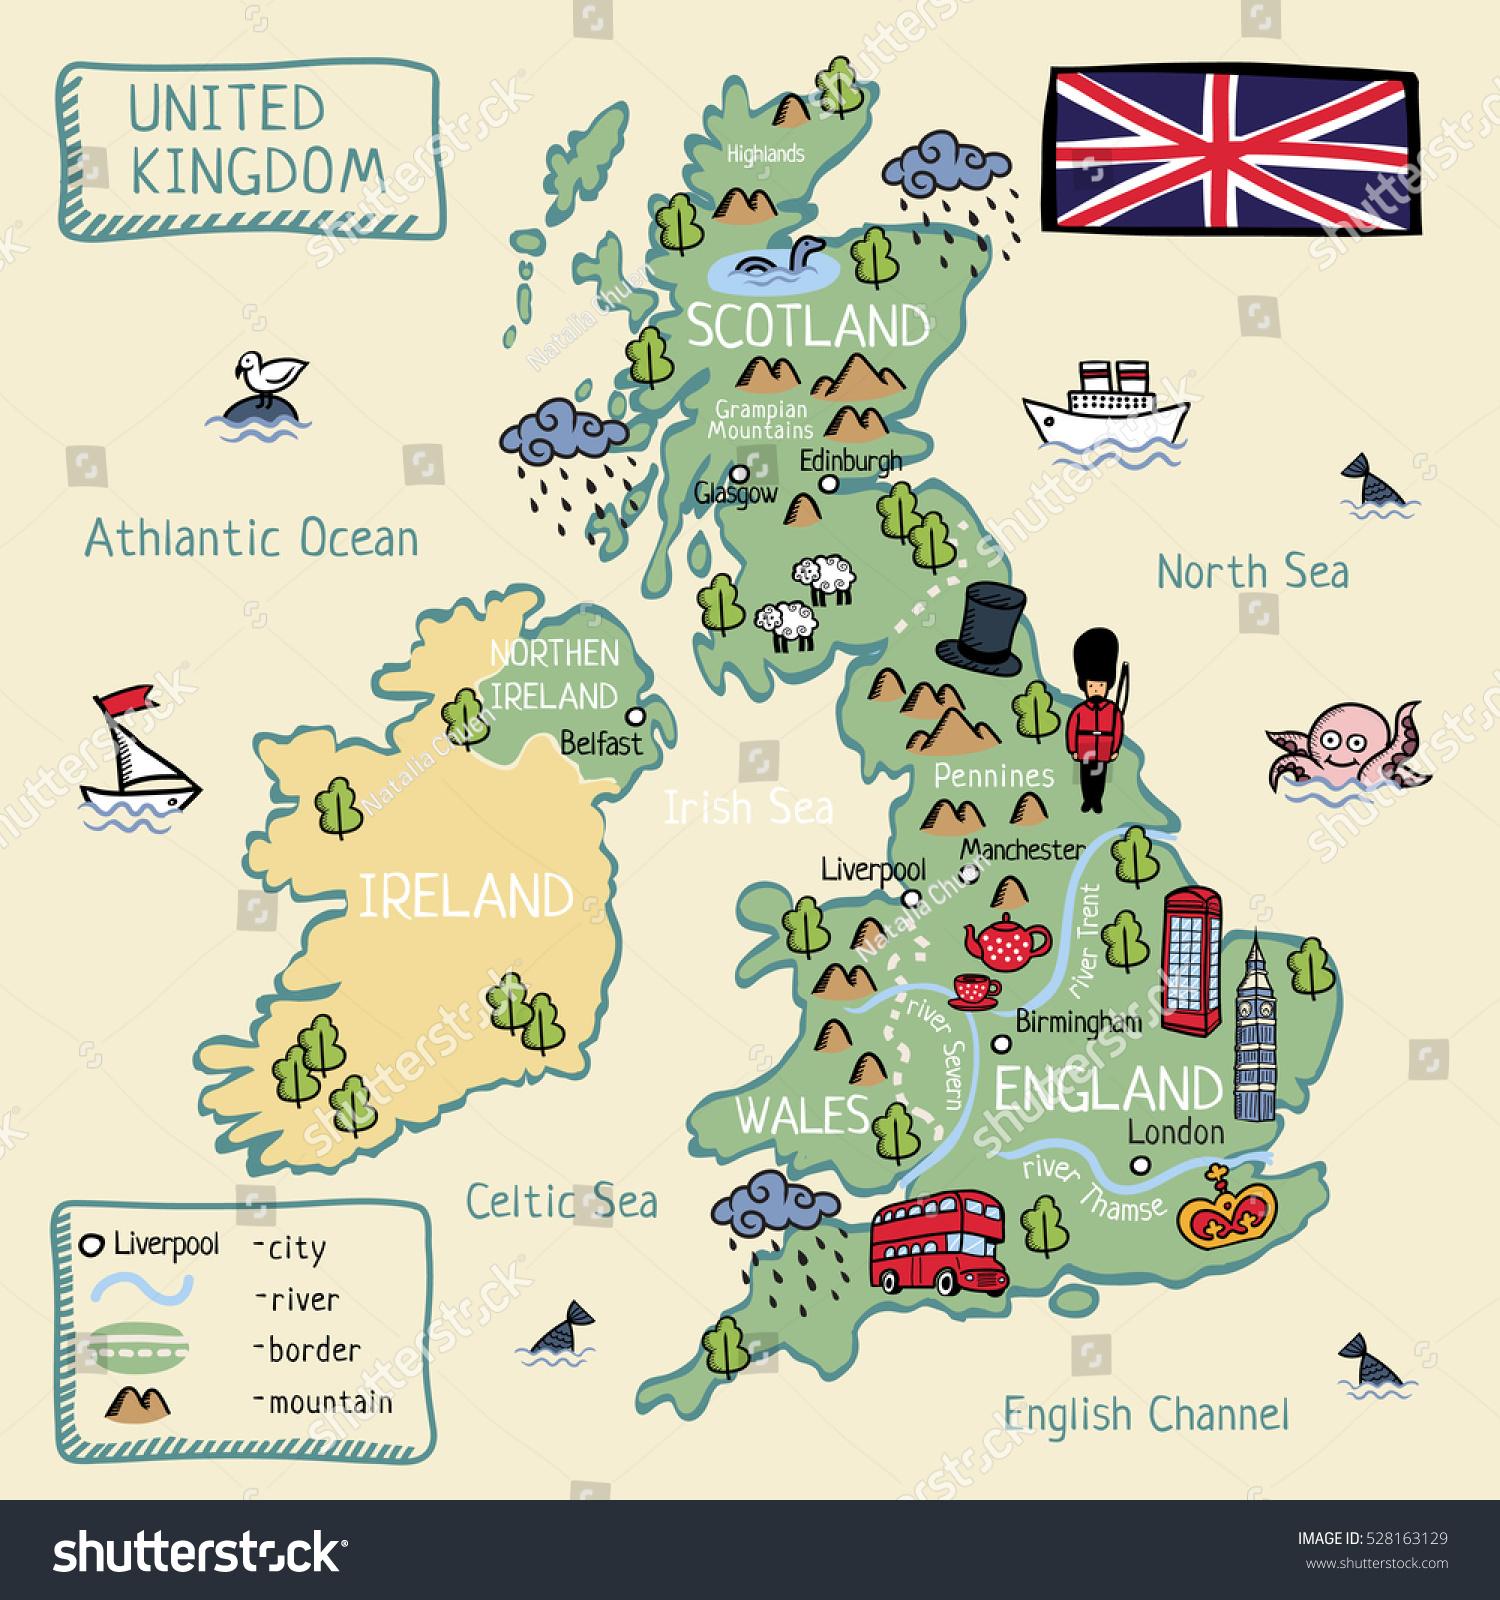 Cartoon Kort Over Storbritannien England Skotland Lagervektor